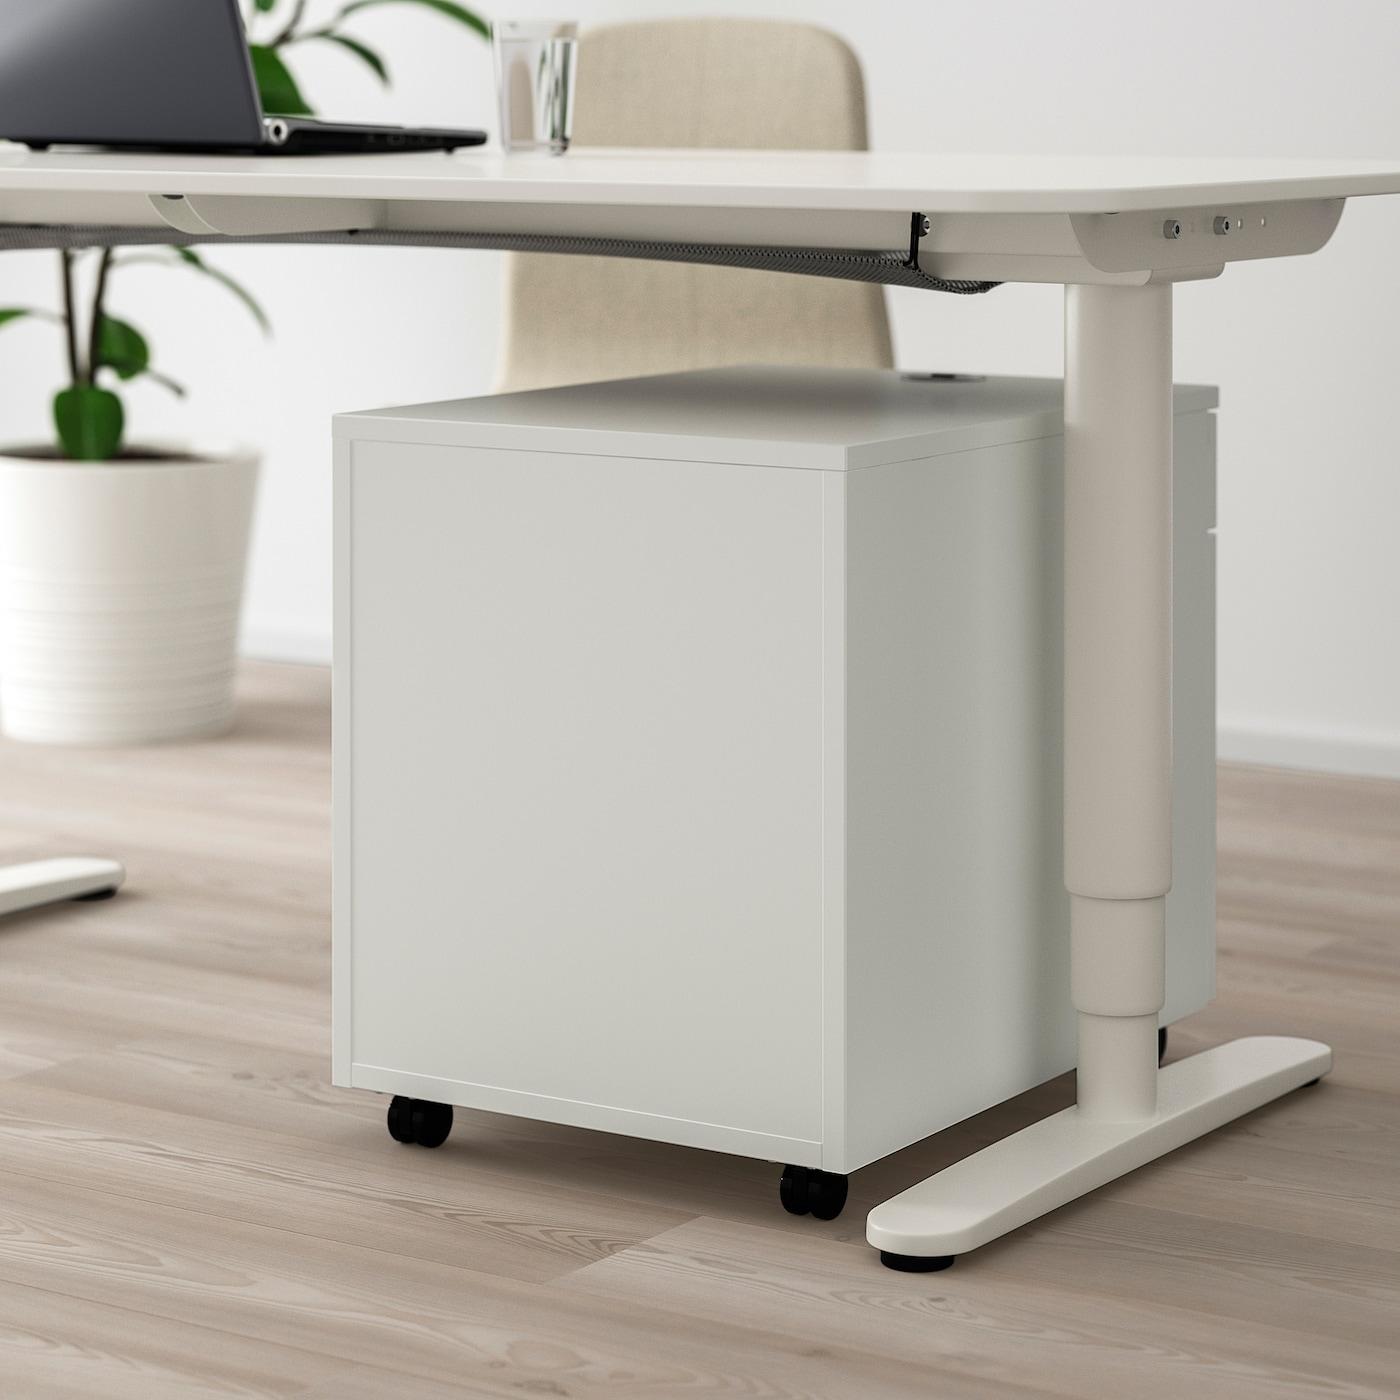 Galant Drawer Unit Drop File Storage White 17 3 4x21 5 8 Ikea